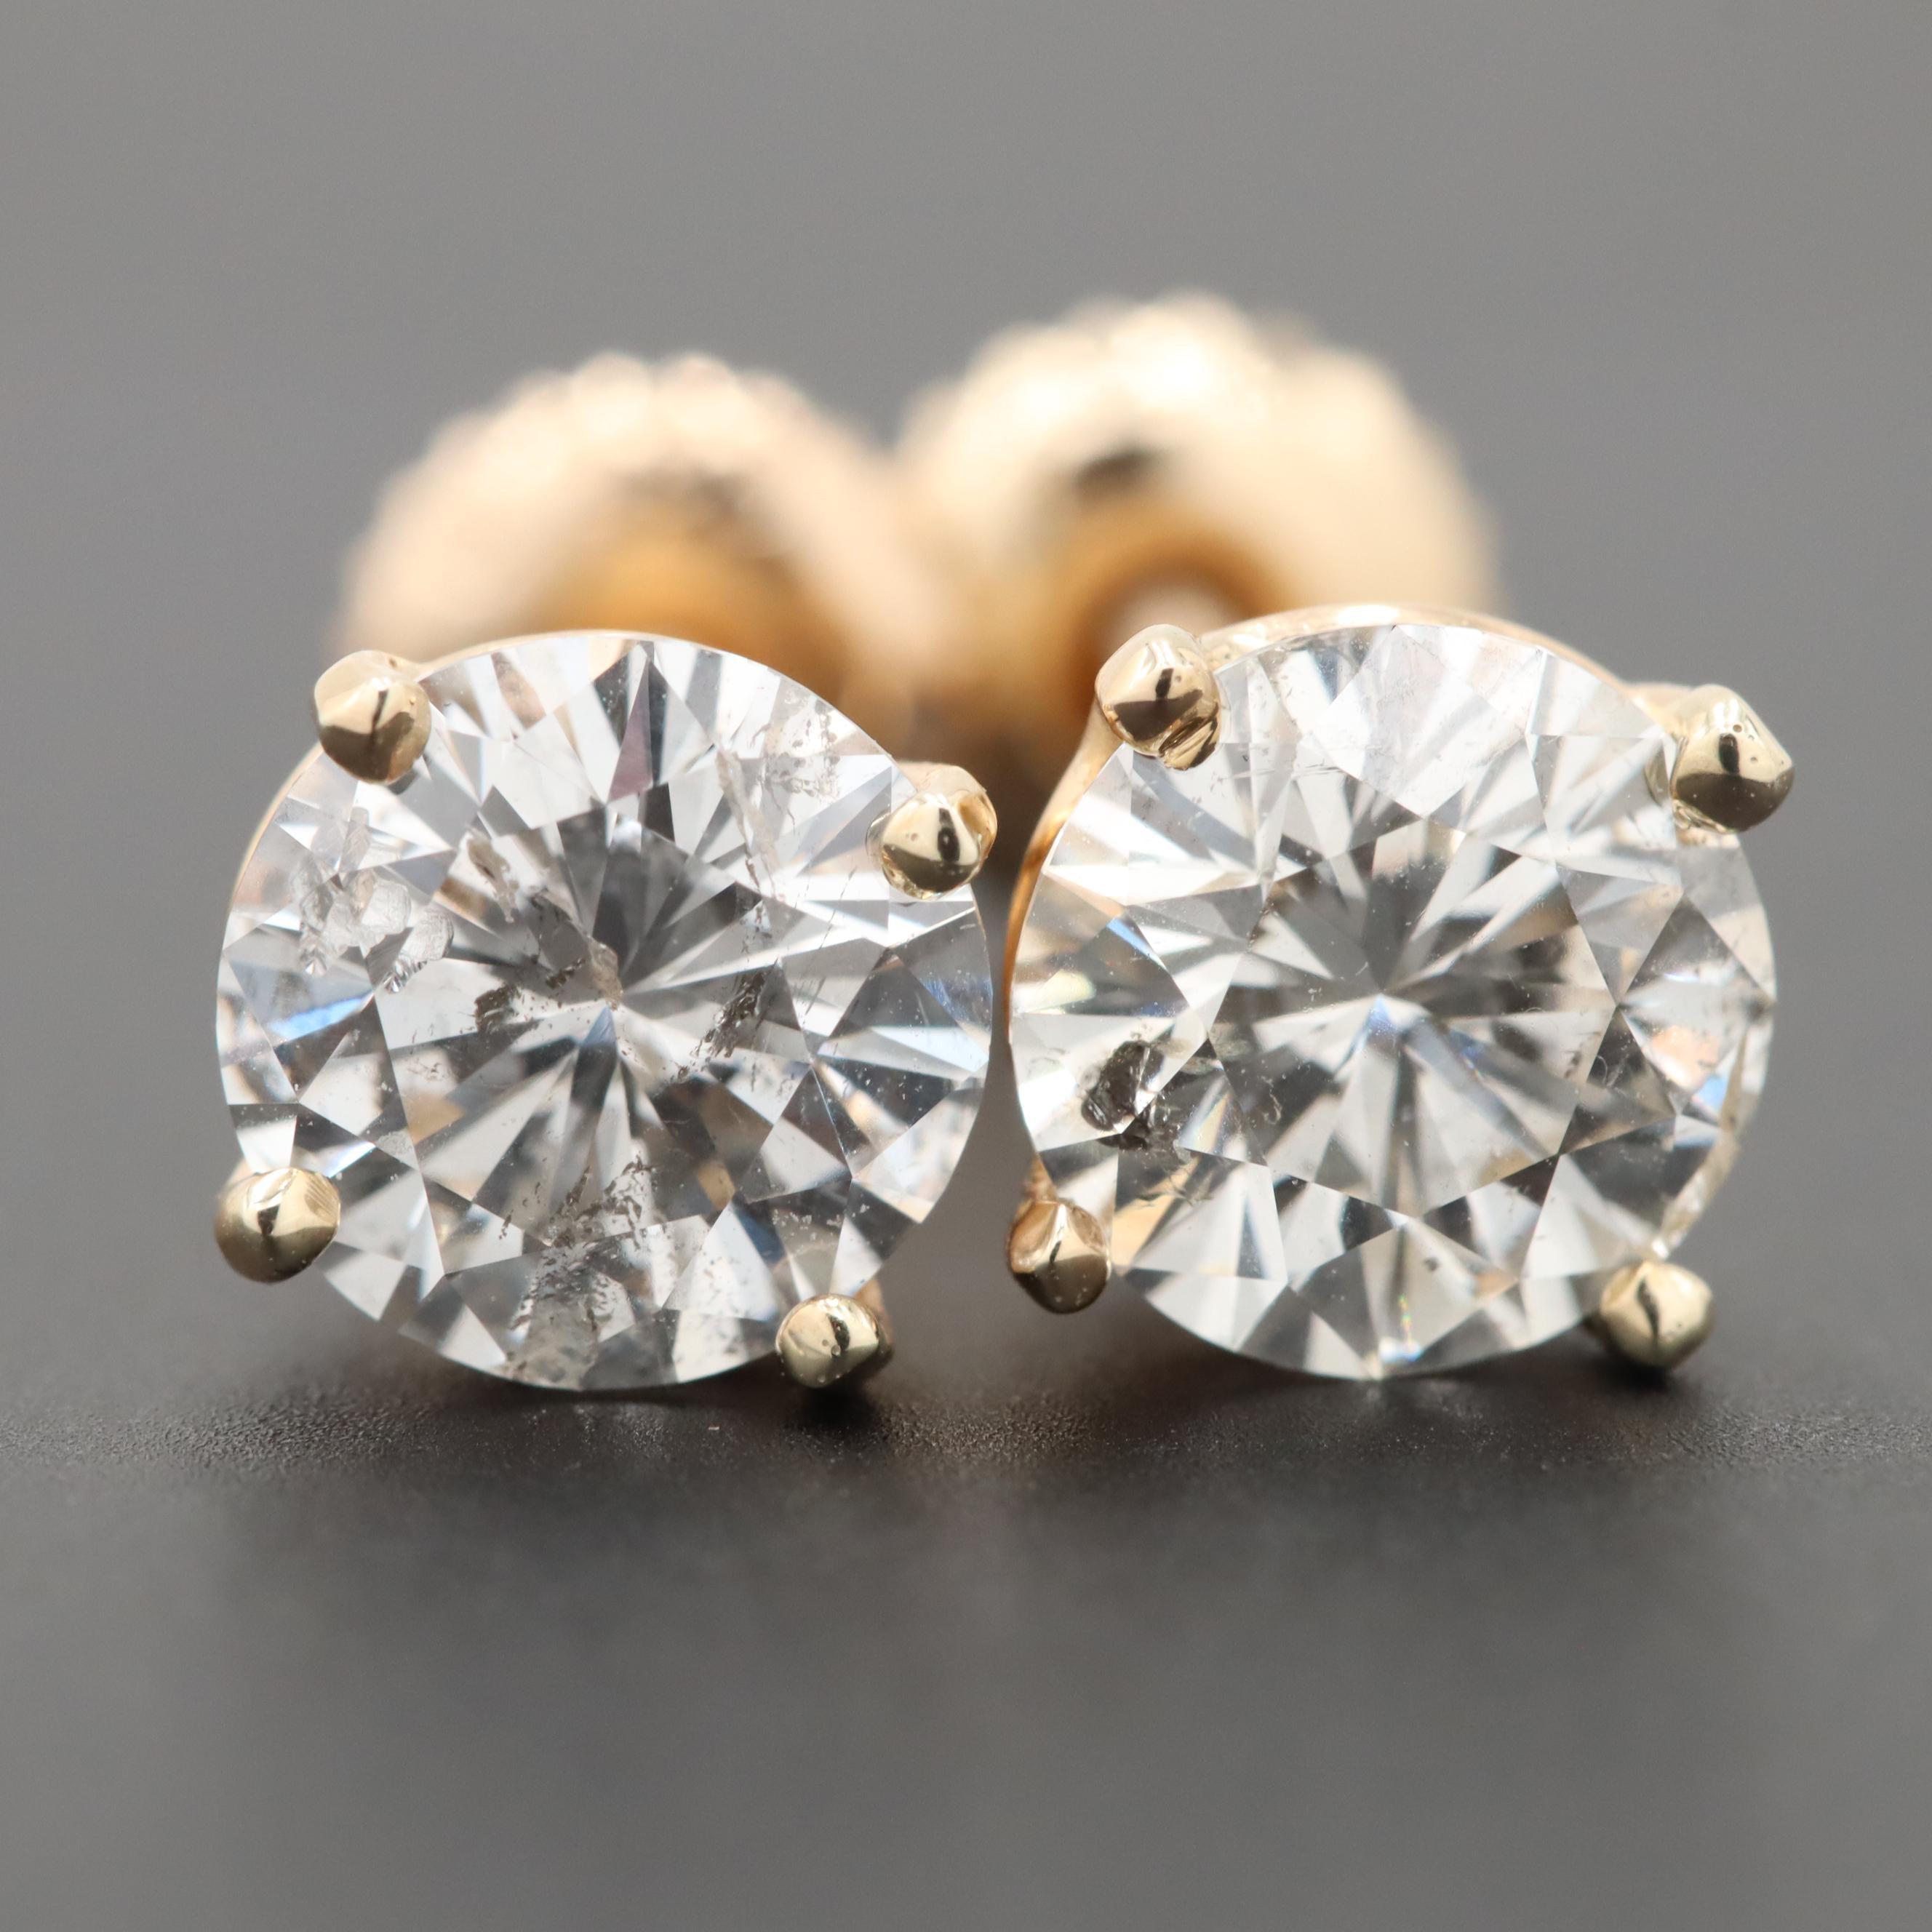 14K Yellow Gold 2.33 CTW Diamond Stud Earring